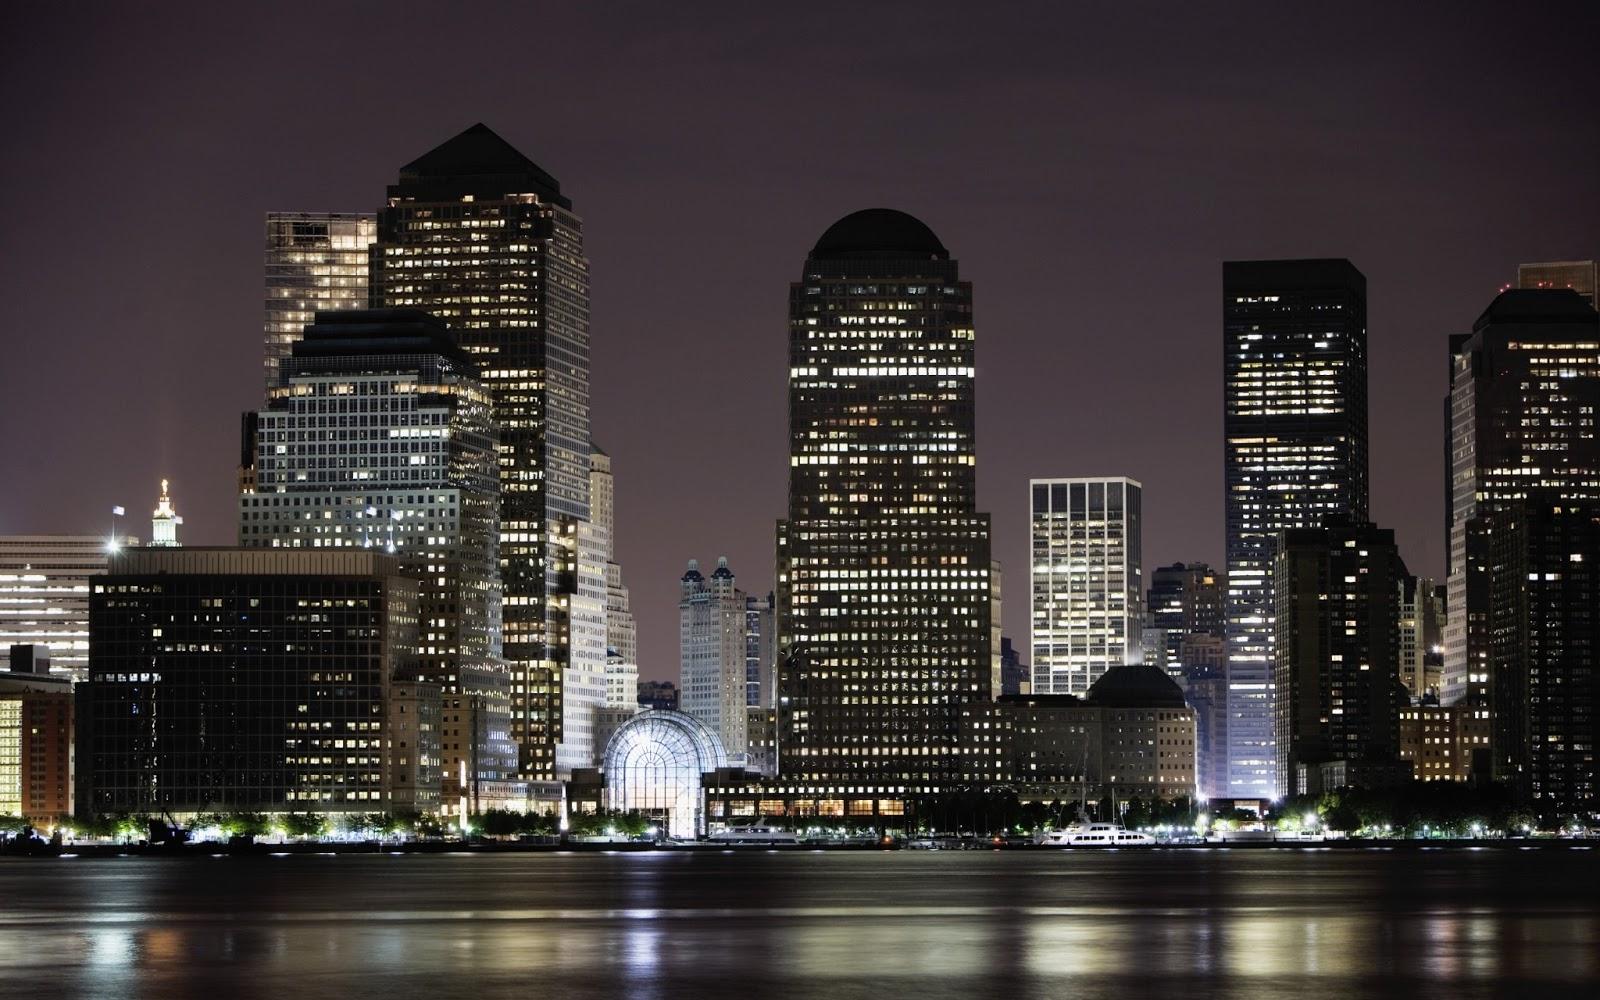 http://3.bp.blogspot.com/-n4K-I3uulJ8/USg9AxJGAzI/AAAAAAAA3-g/ziZVLuQsah4/s1600/New-York-City-NYC_Fotos-de-la-Ciudad-de-New-York.jpg